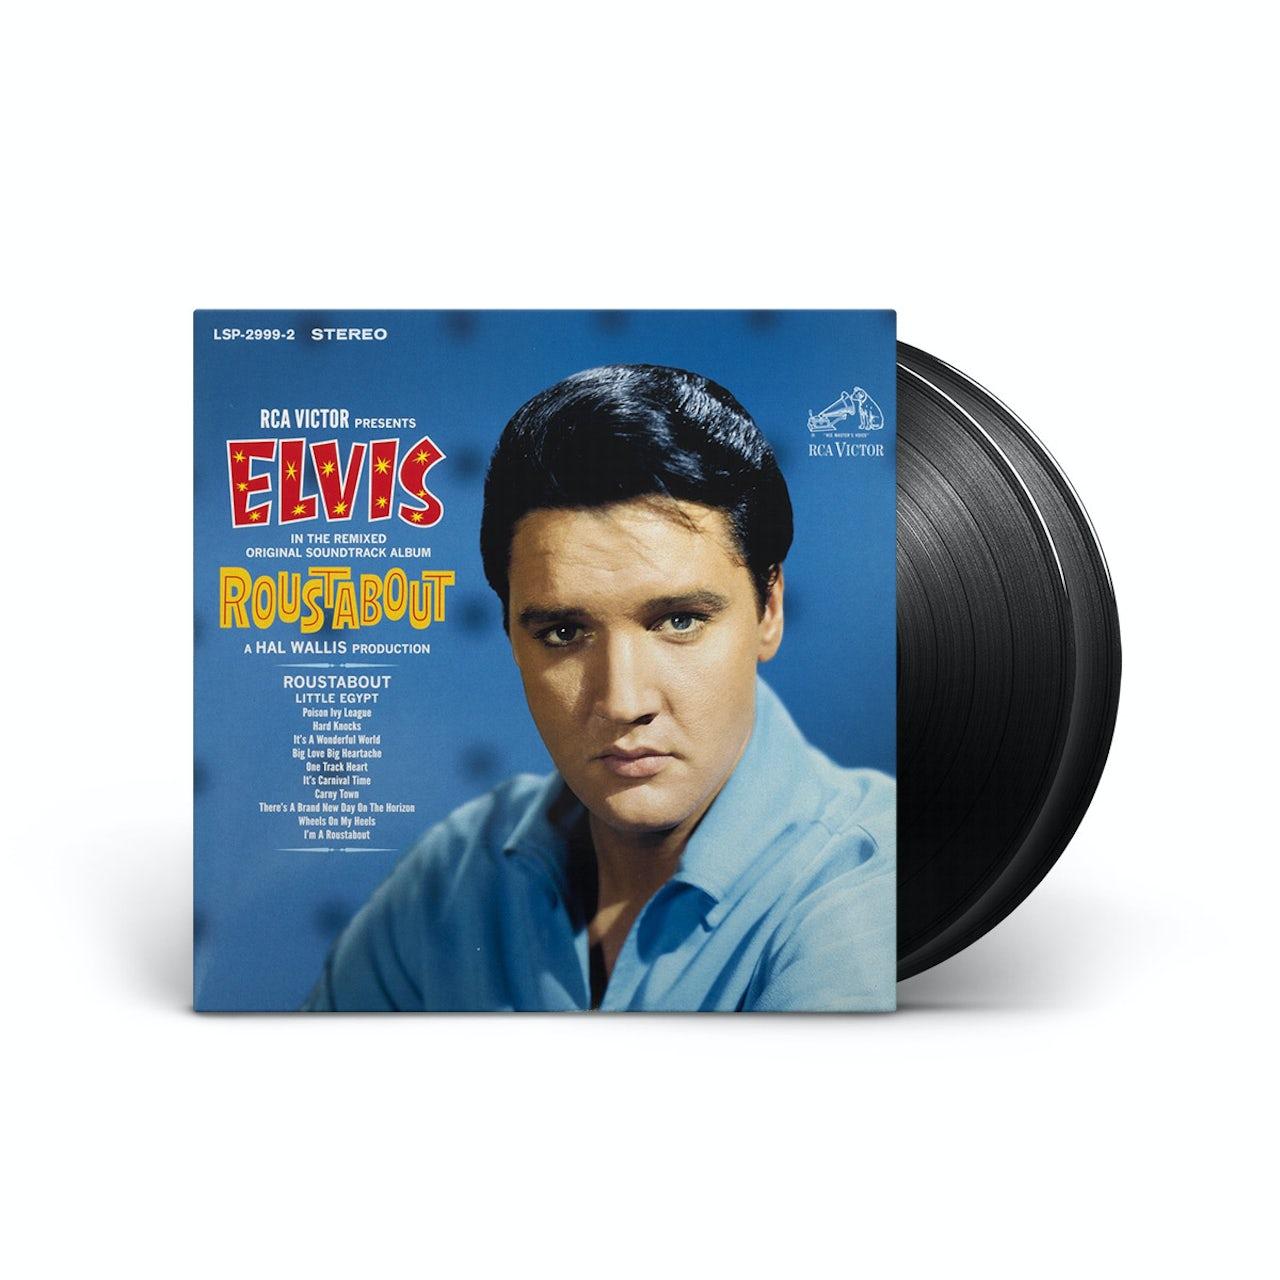 Elvis Presley Limited Edition Roustabout 2-Disc FTD LP (Vinyl)